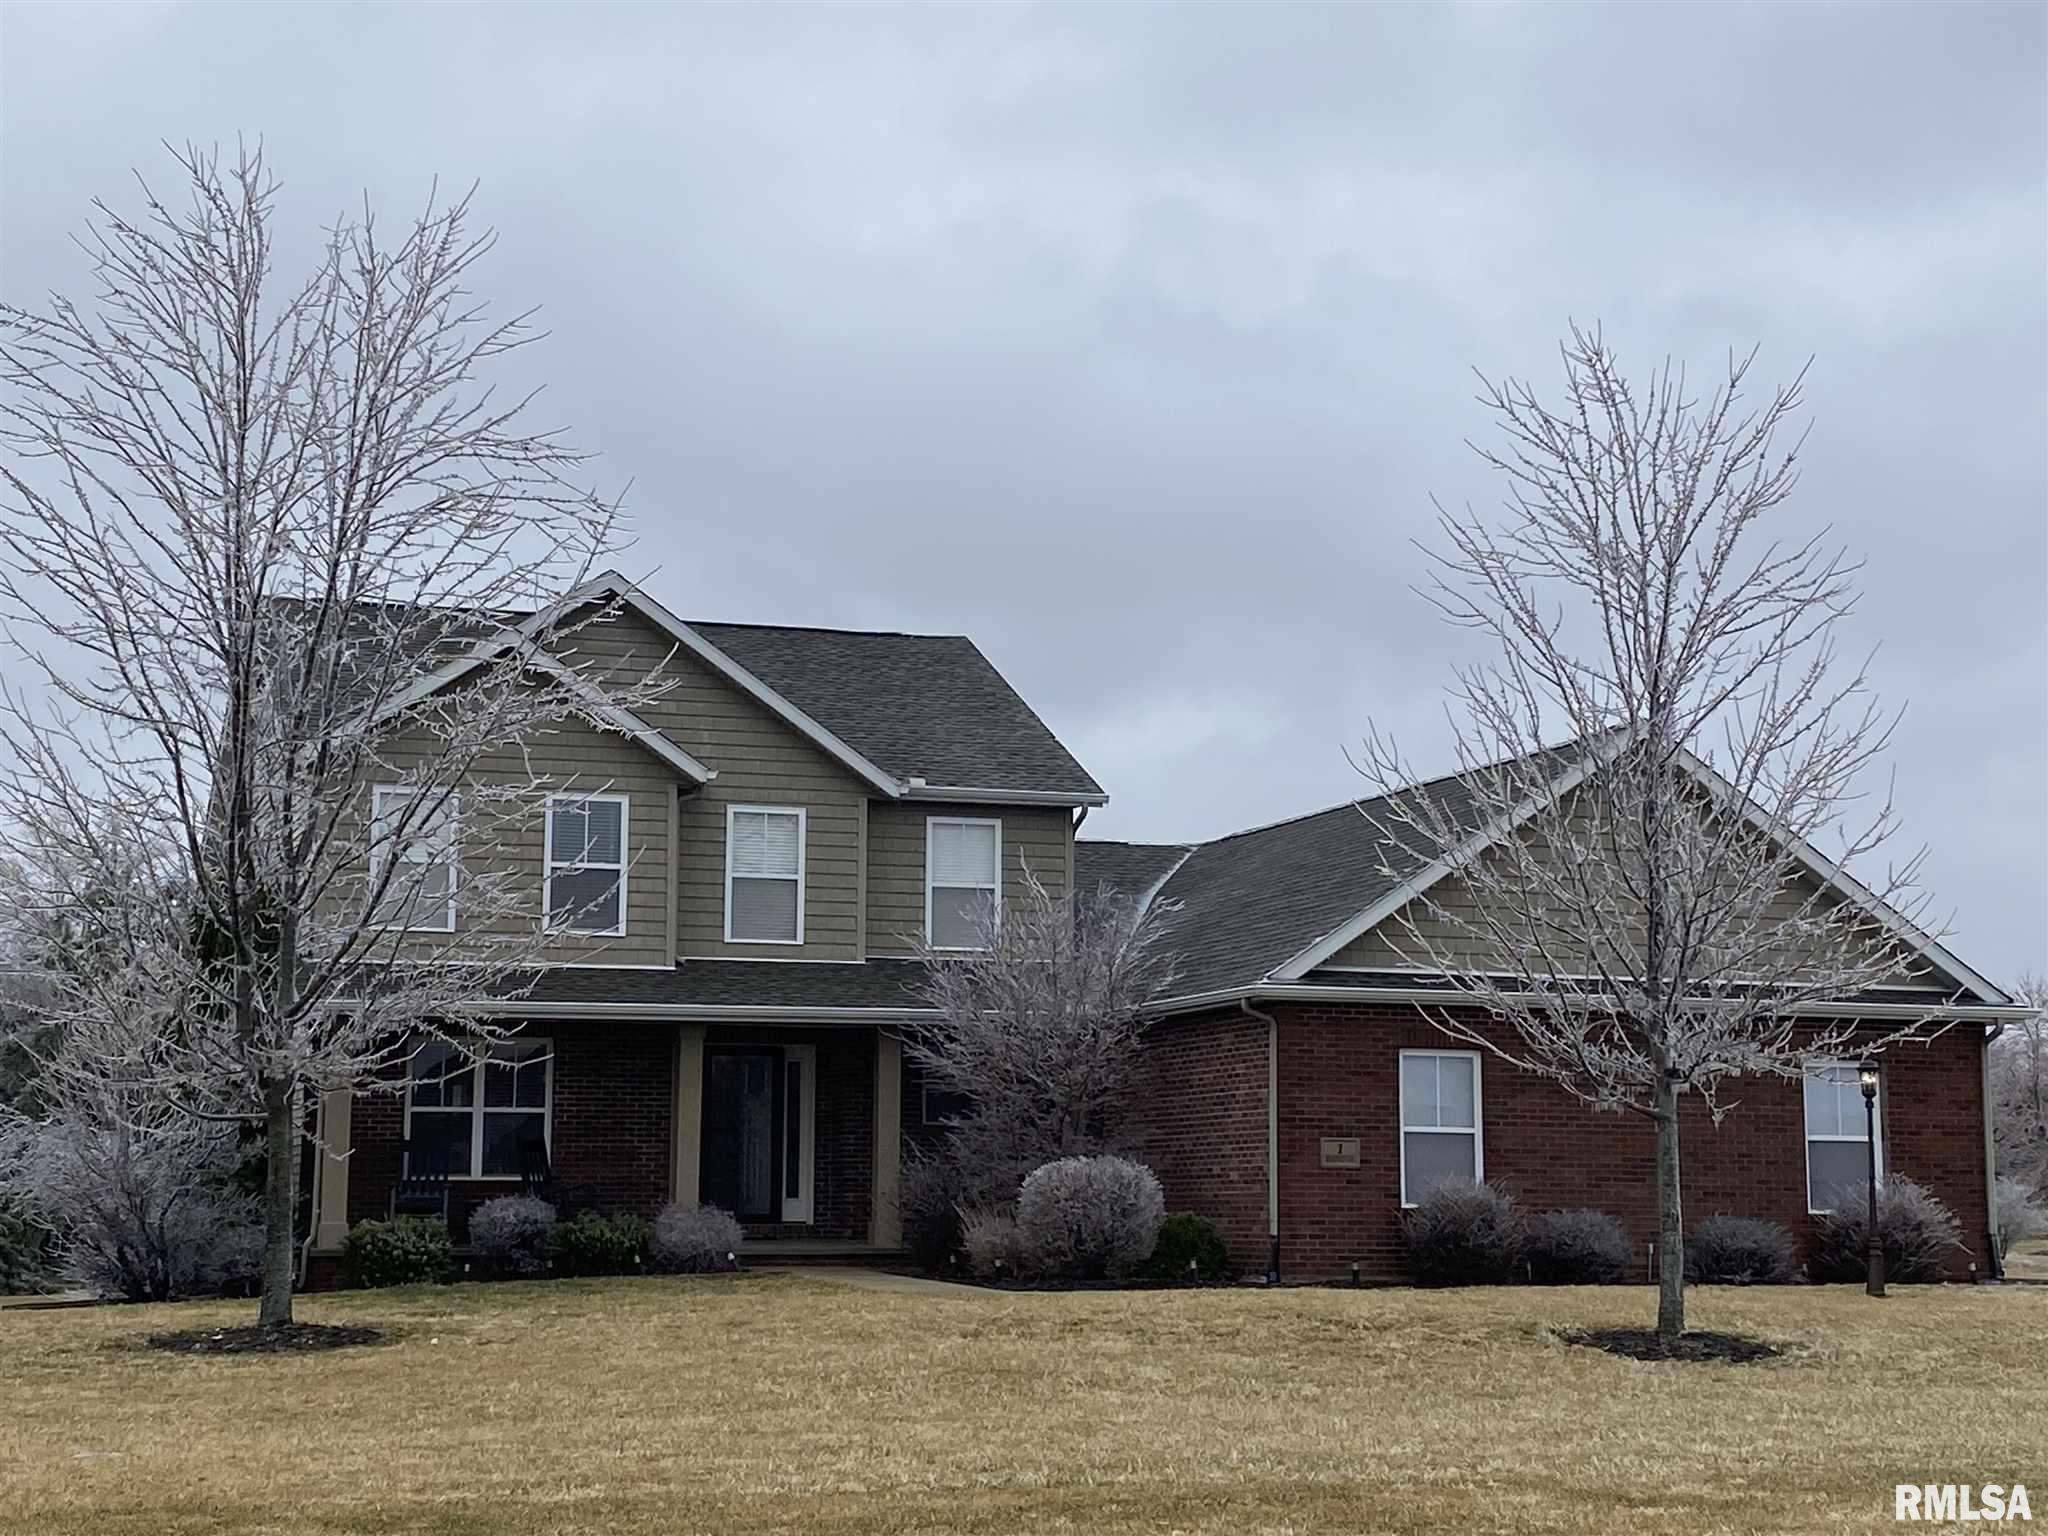 1 BRIARWOOD Property Photo - Metamora, IL real estate listing